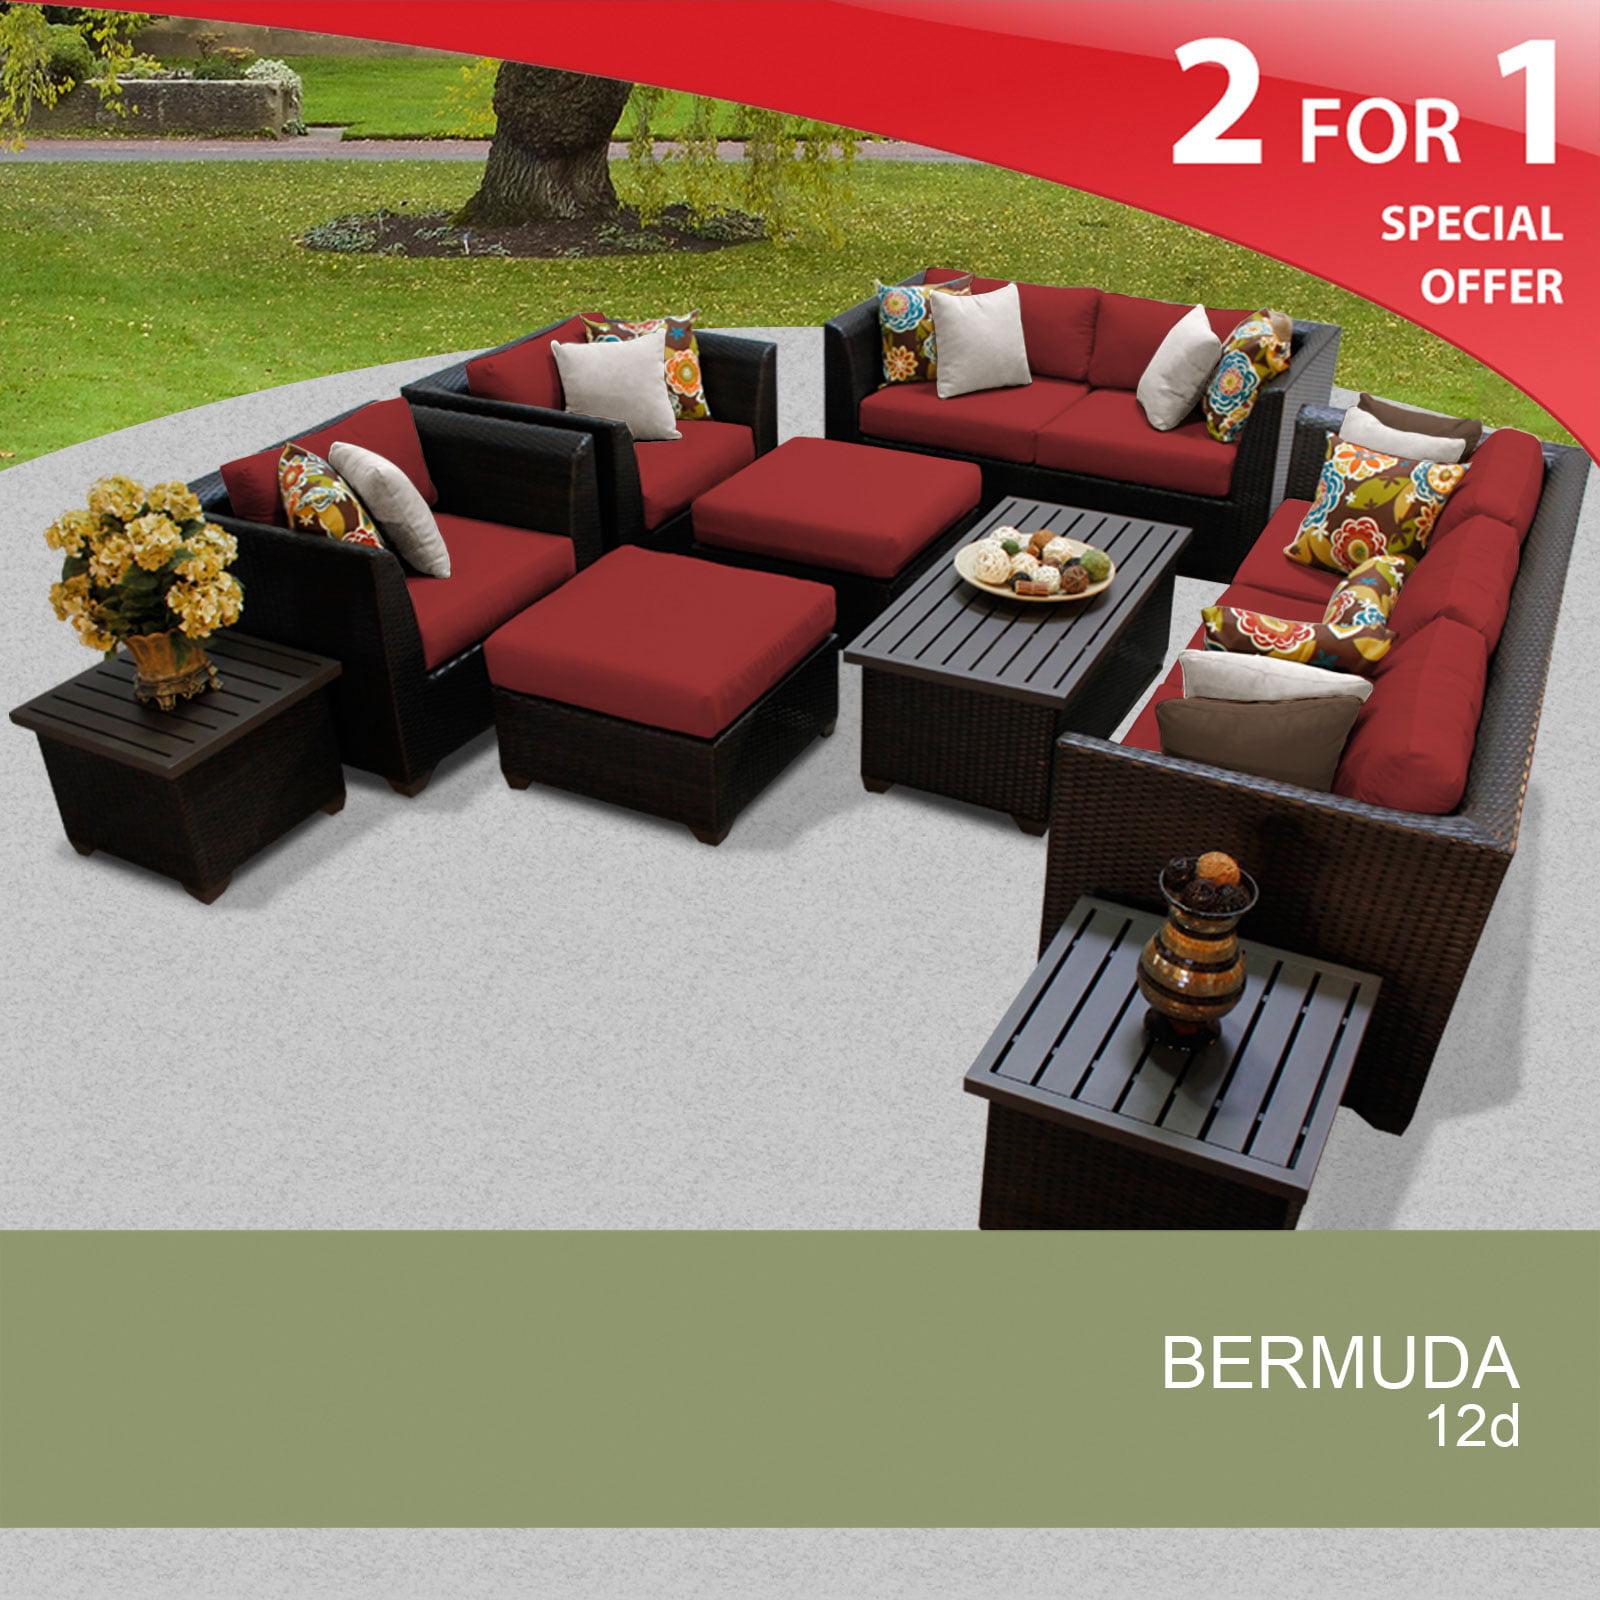 12 Piece Outdoor Wicker Patio Furniture